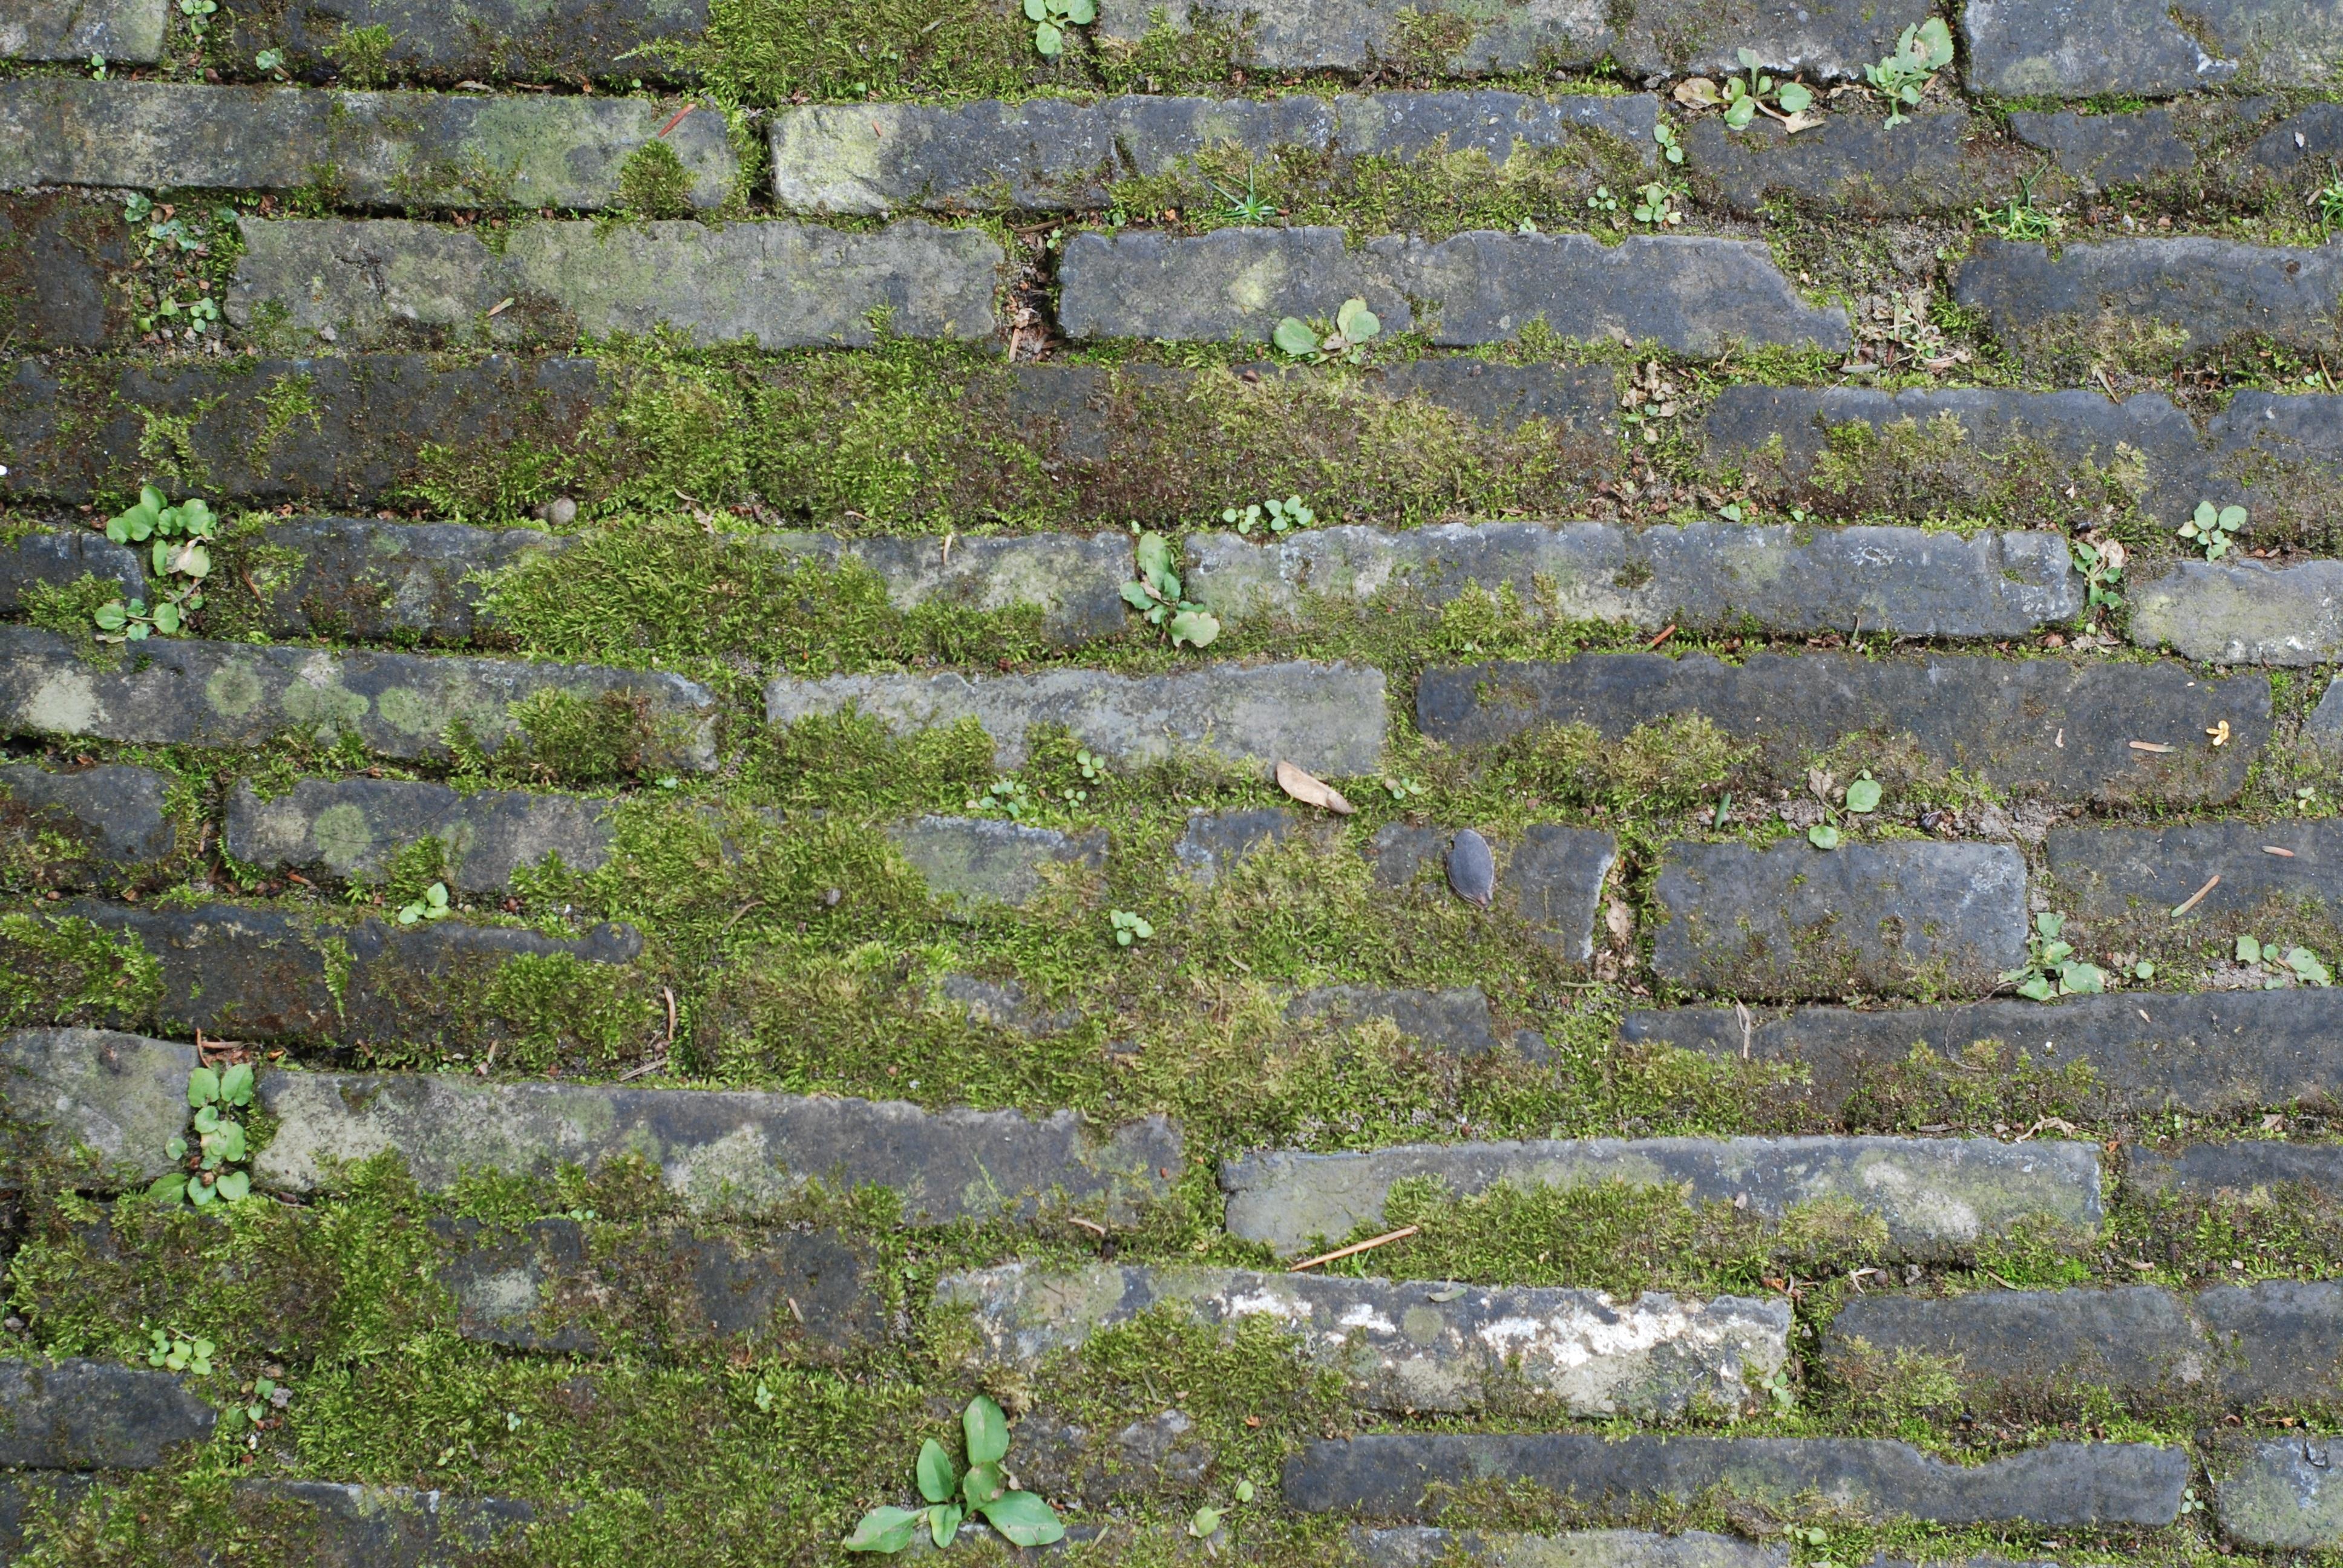 Kostenlose Foto Gras Rock Boden Rasen Textur Mauer Moos